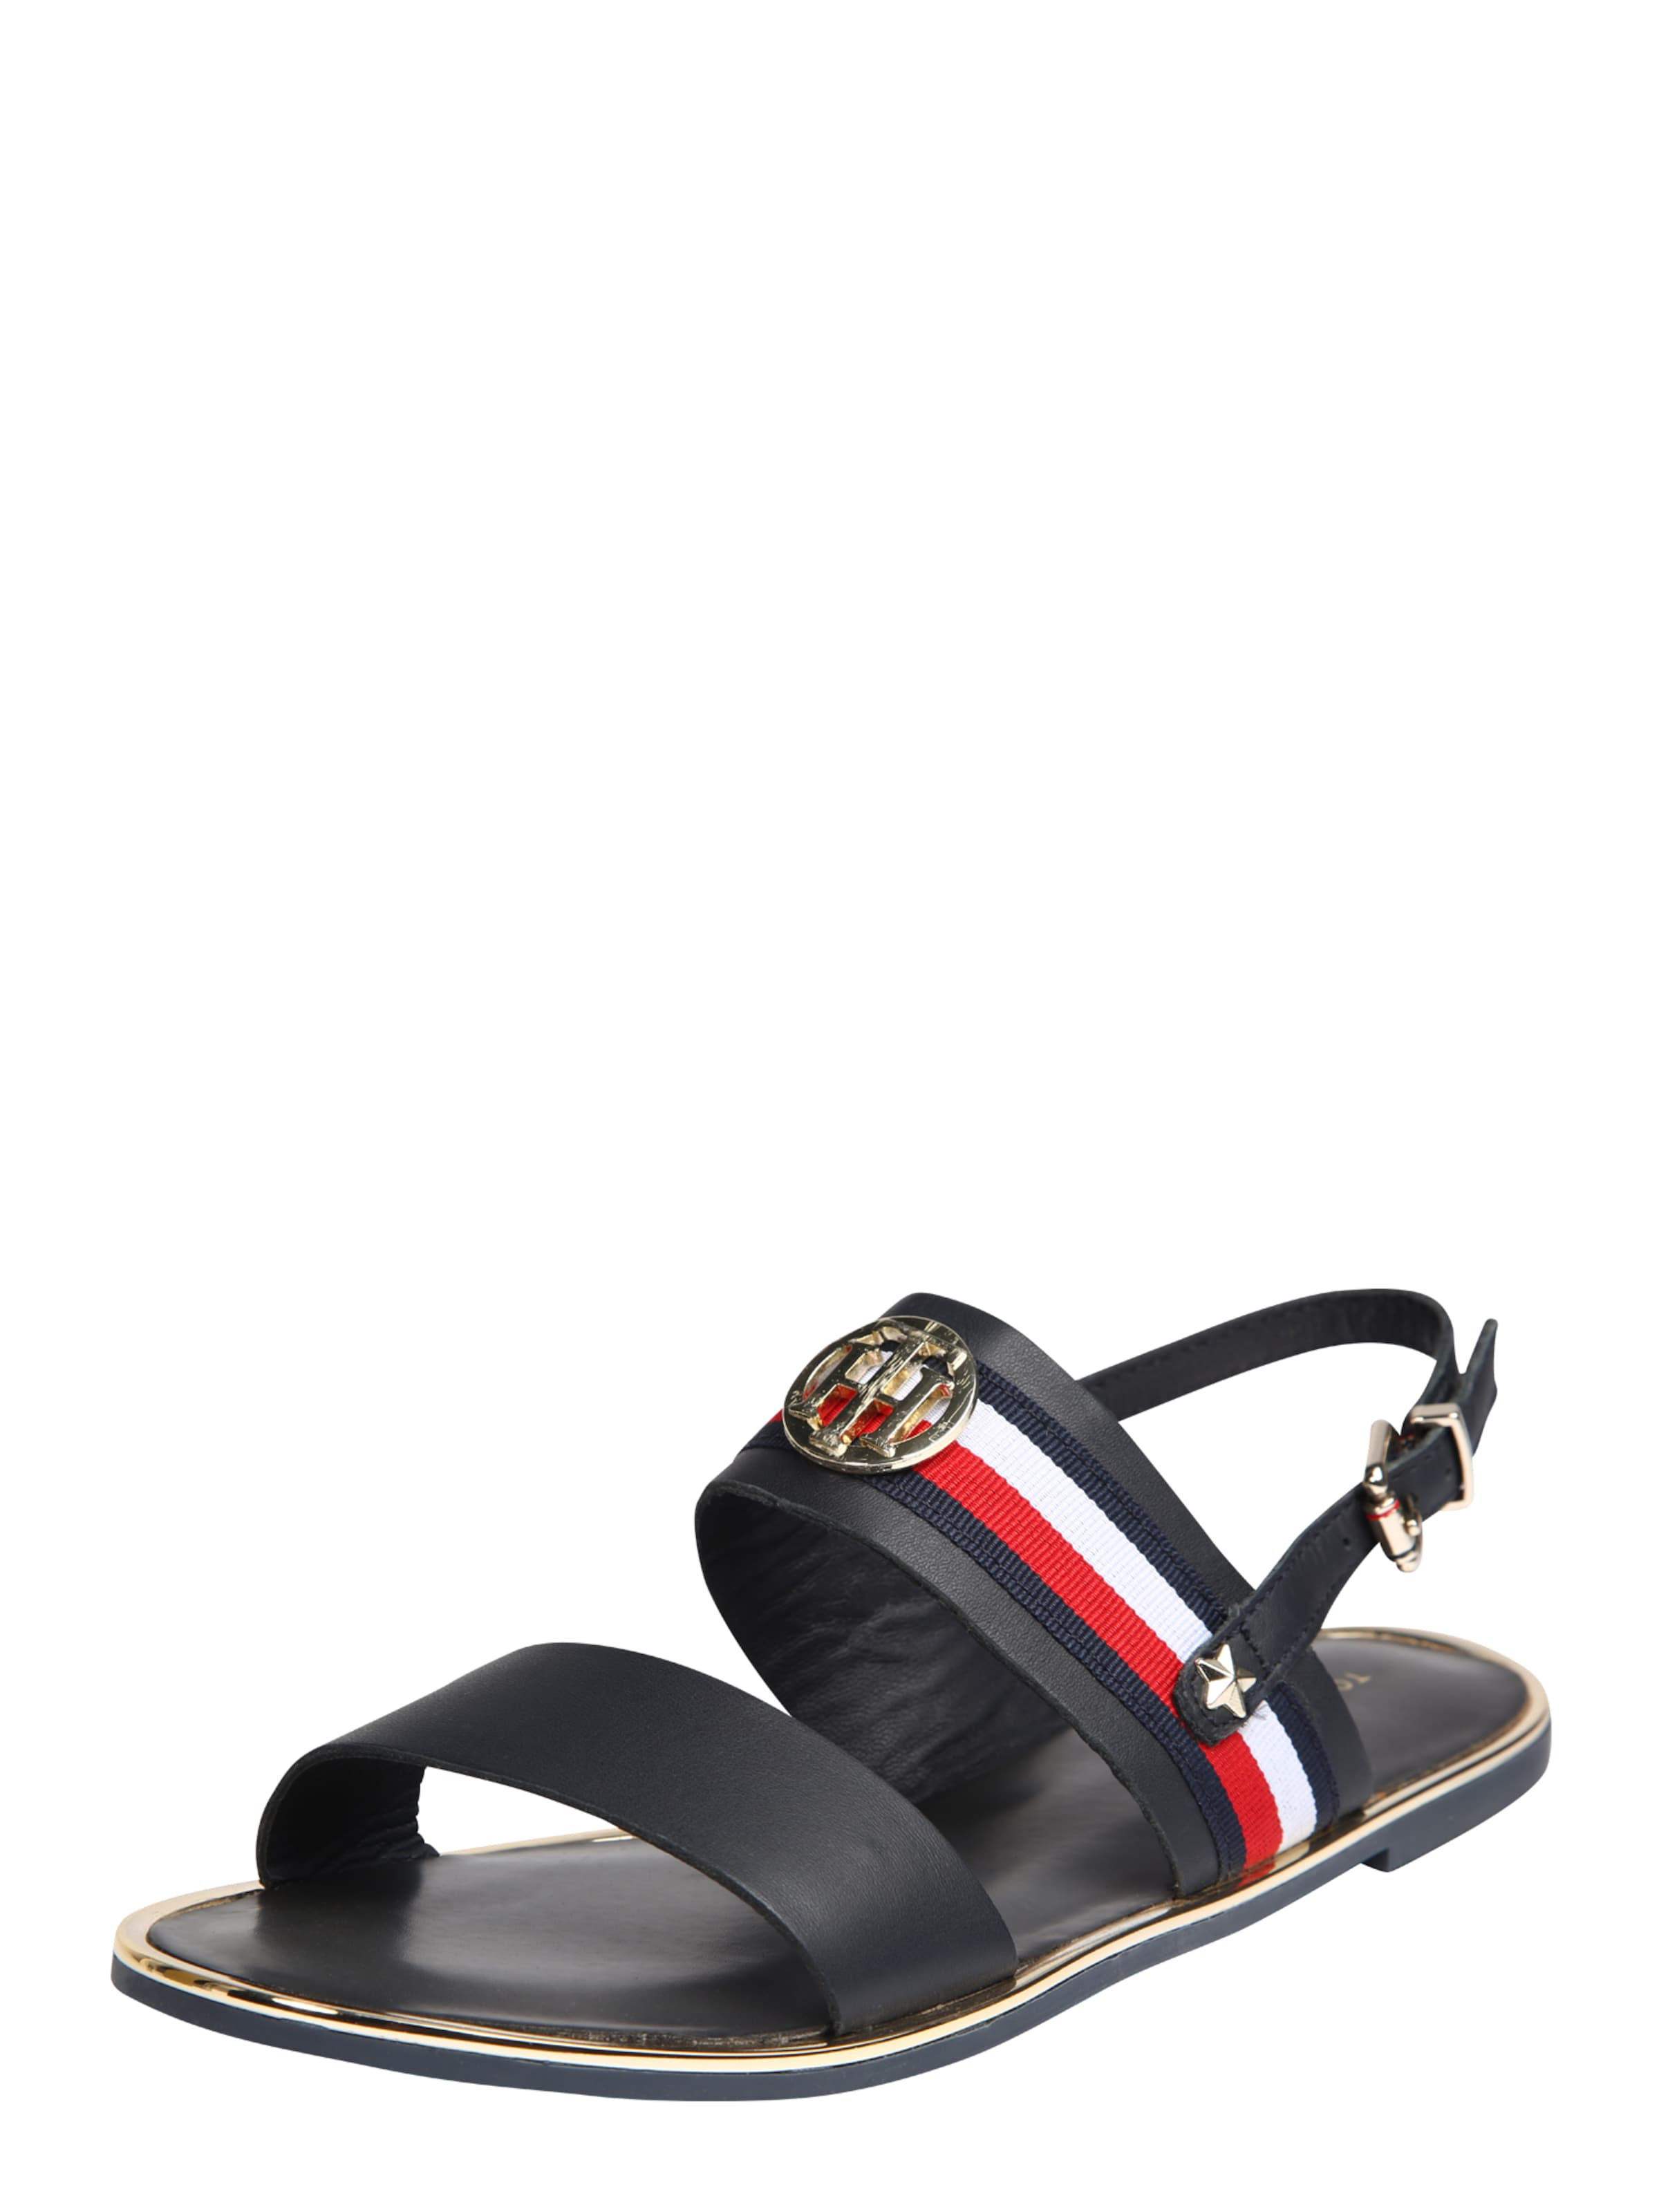 TOMMY HILFIGER | Sandale 'CORPORATE RIBBON FLAT' Schuhe Gut getragene Schuhe